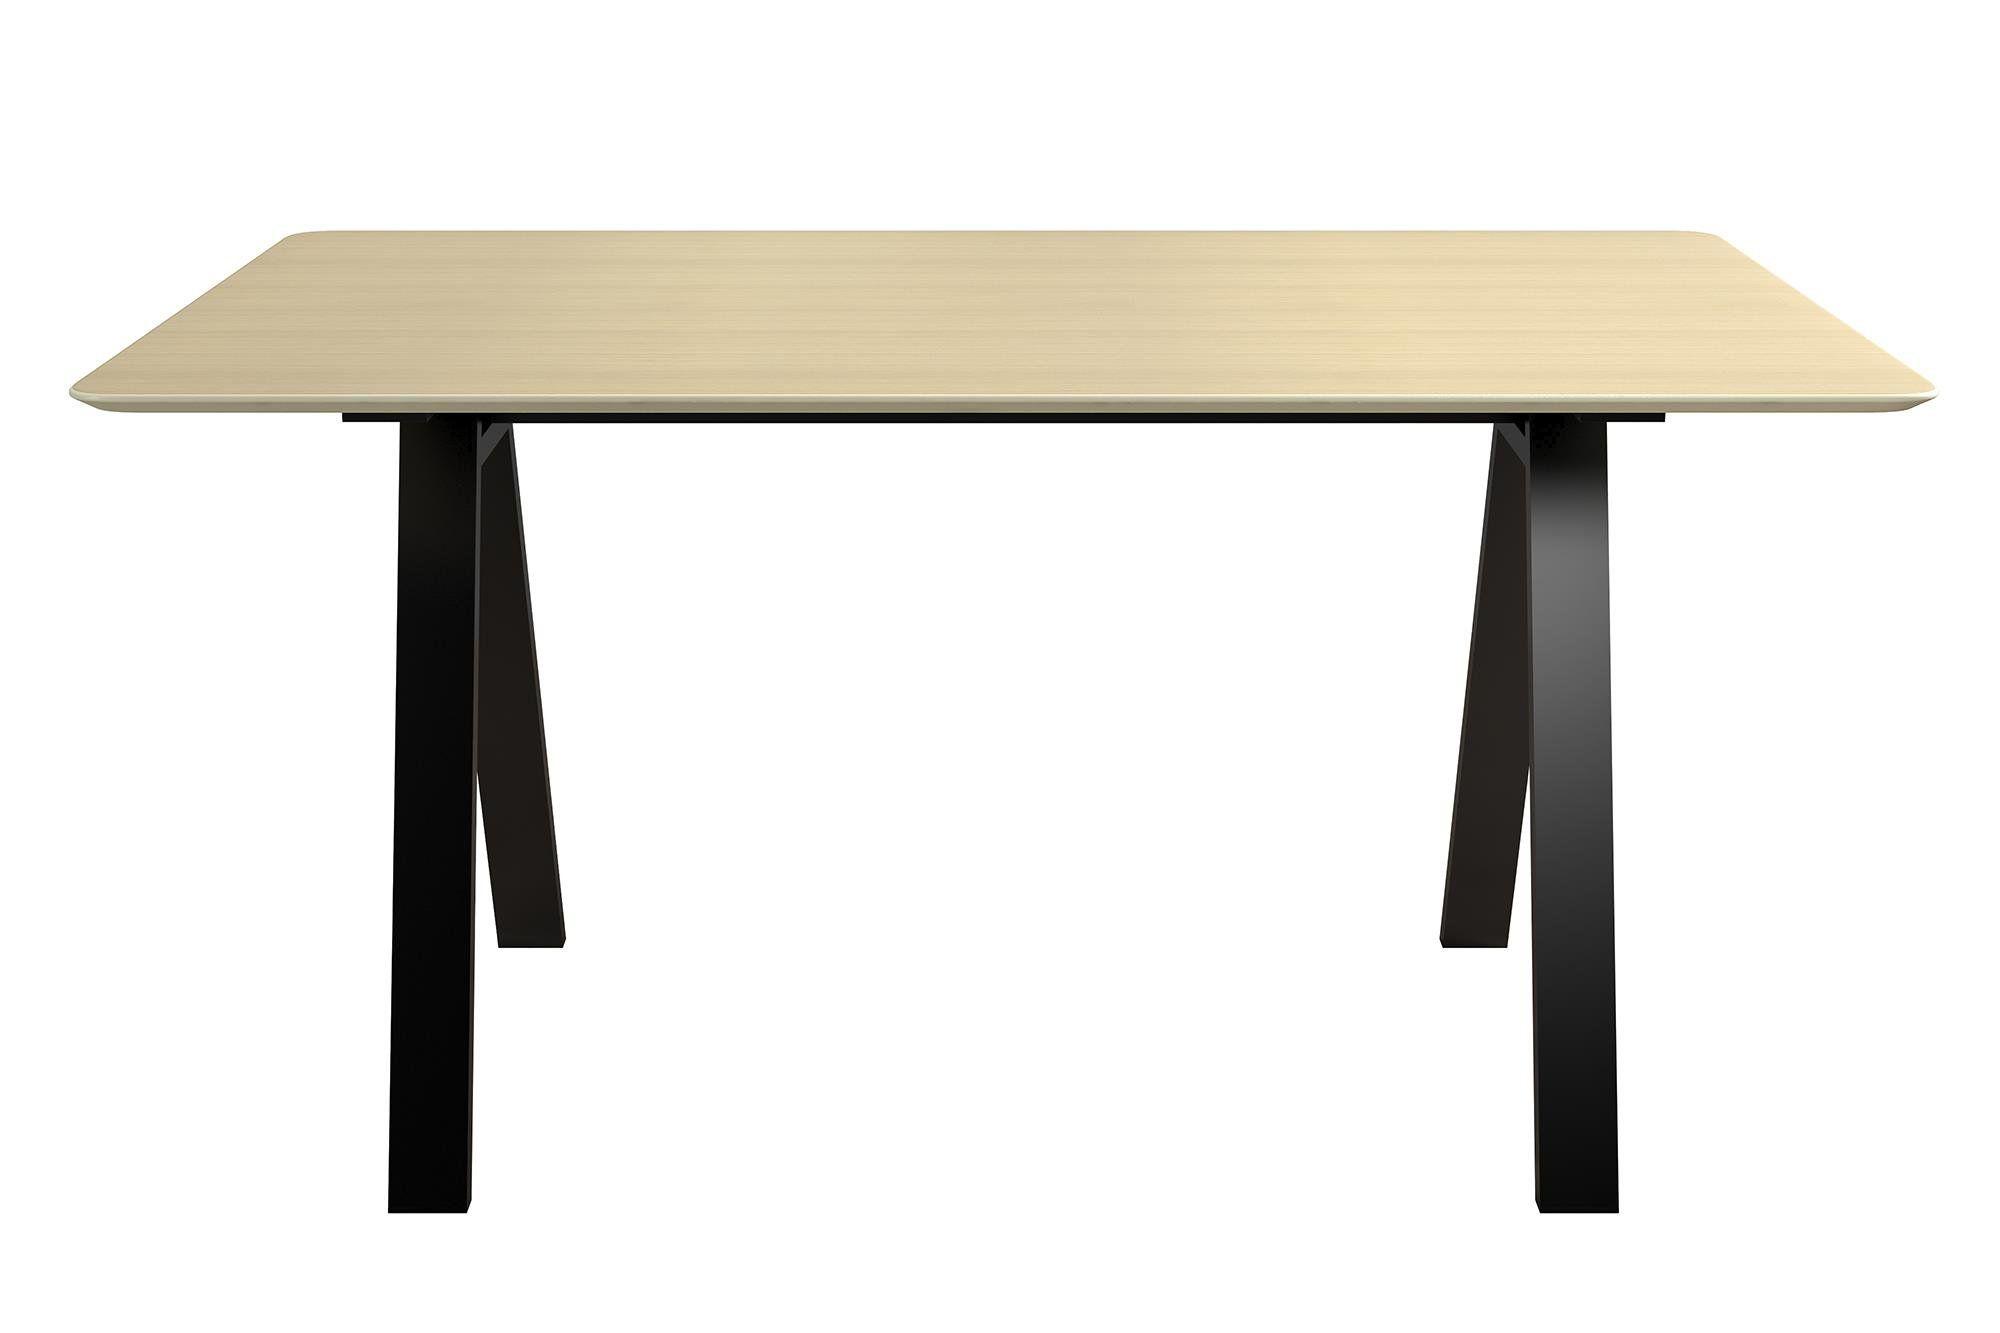 Novogratz Campbell Rectangular Dining Table With Natural Top And